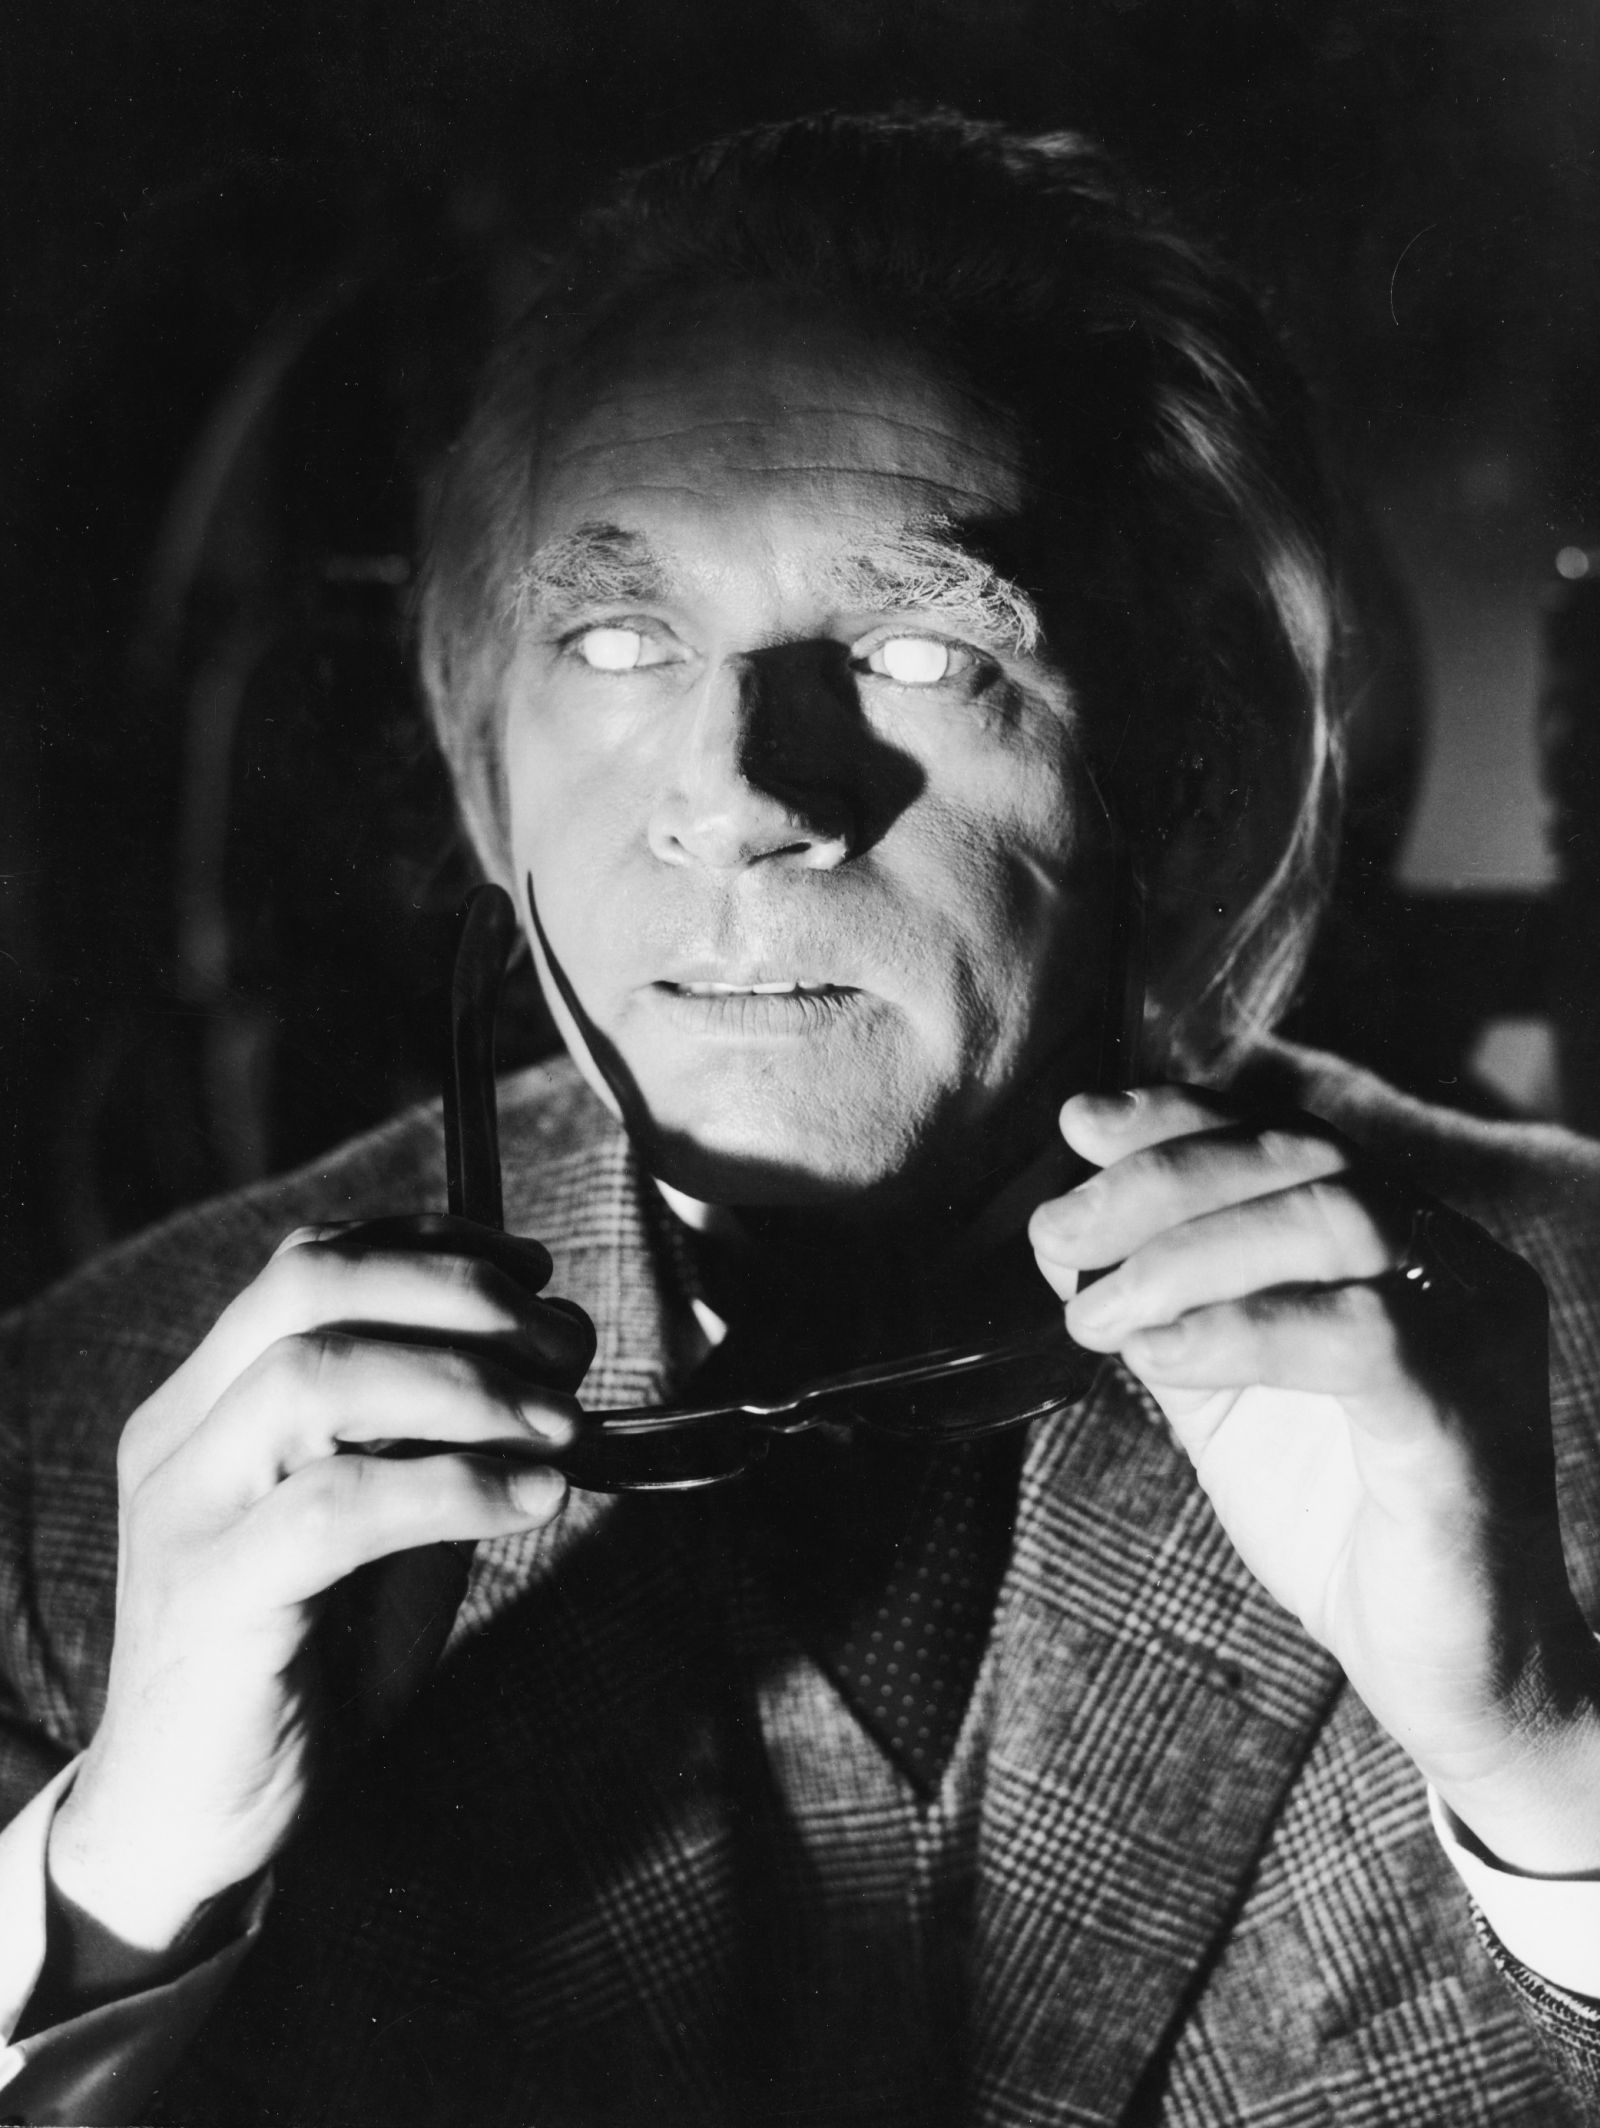 Szenenfoto aus dem Film Die 1000 Augen des Doktor Mabuse